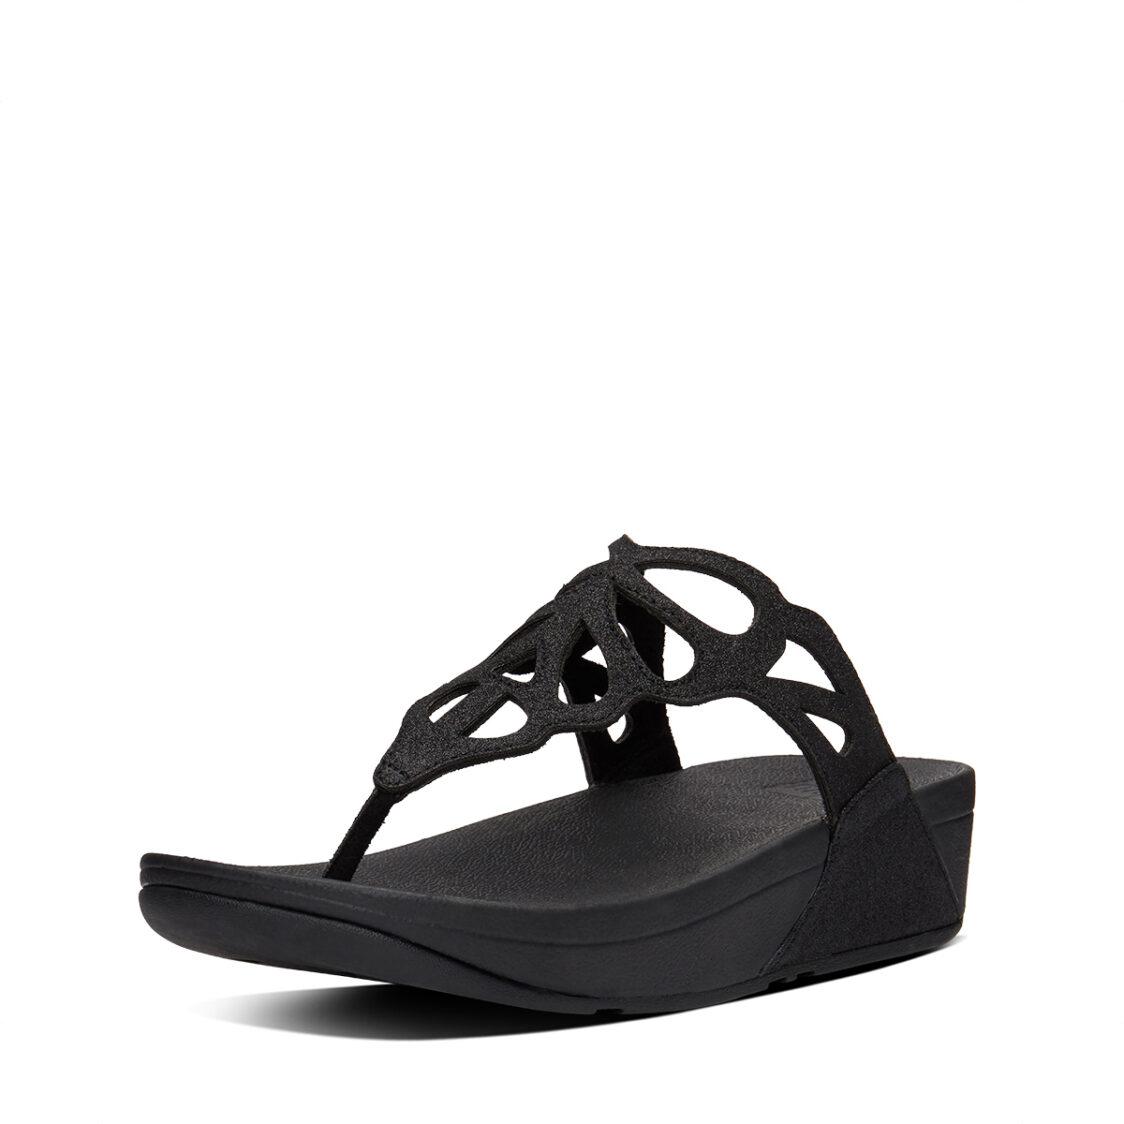 Fitflop Bumble Glitter Toe-Thongs Black